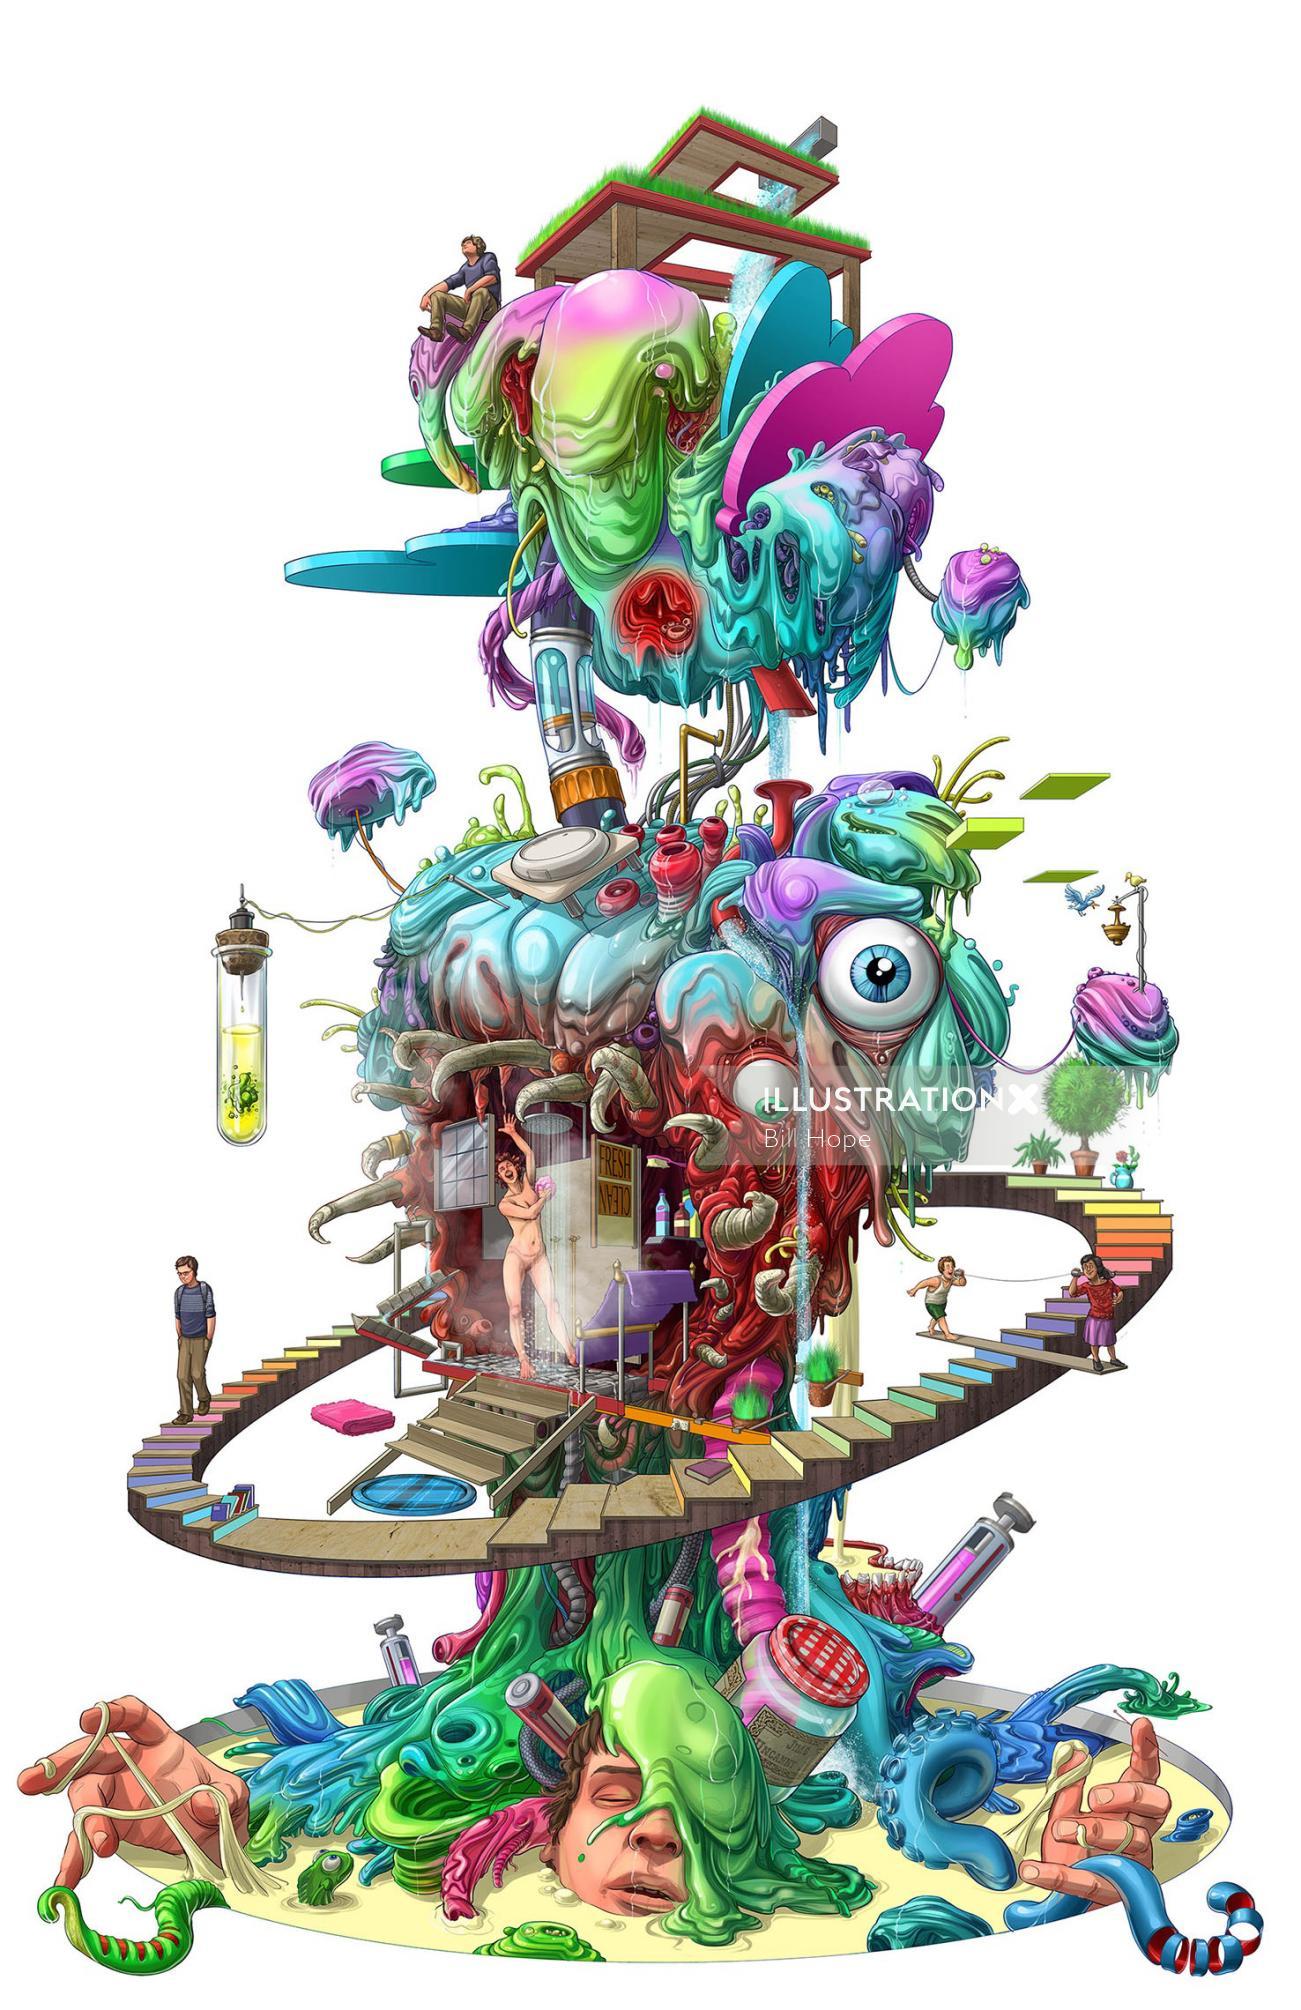 Illustration of abstract dream world